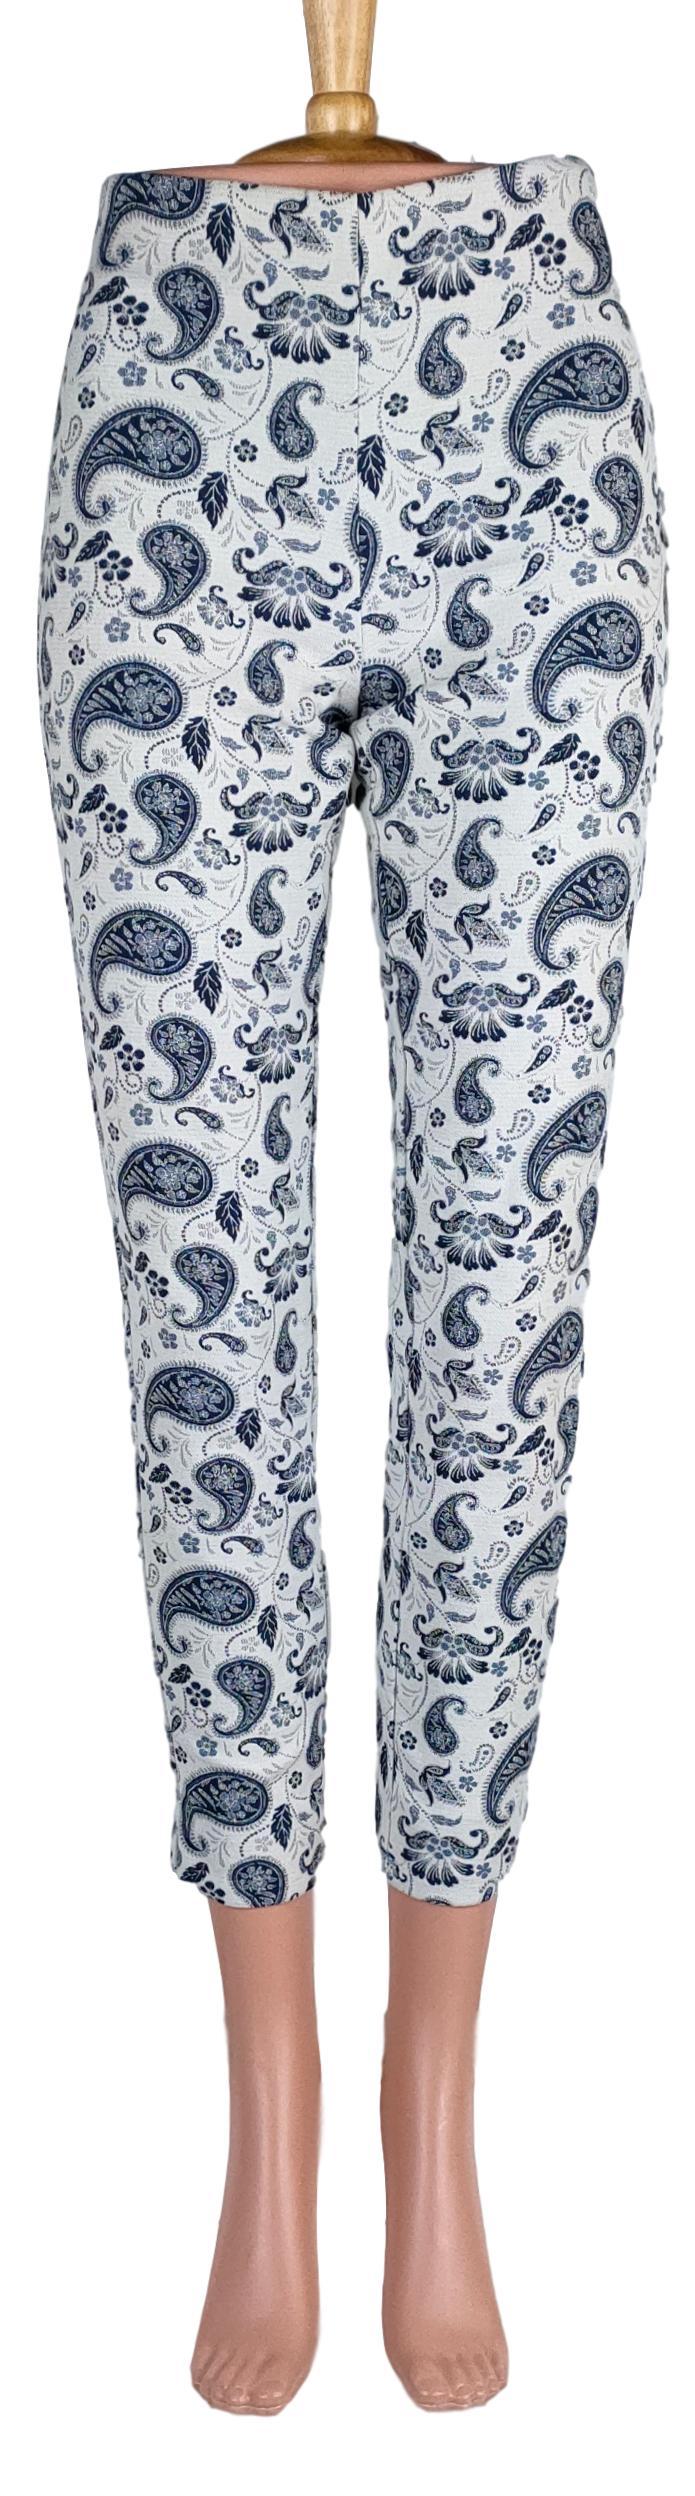 Pantalon MNG  - Taille 36